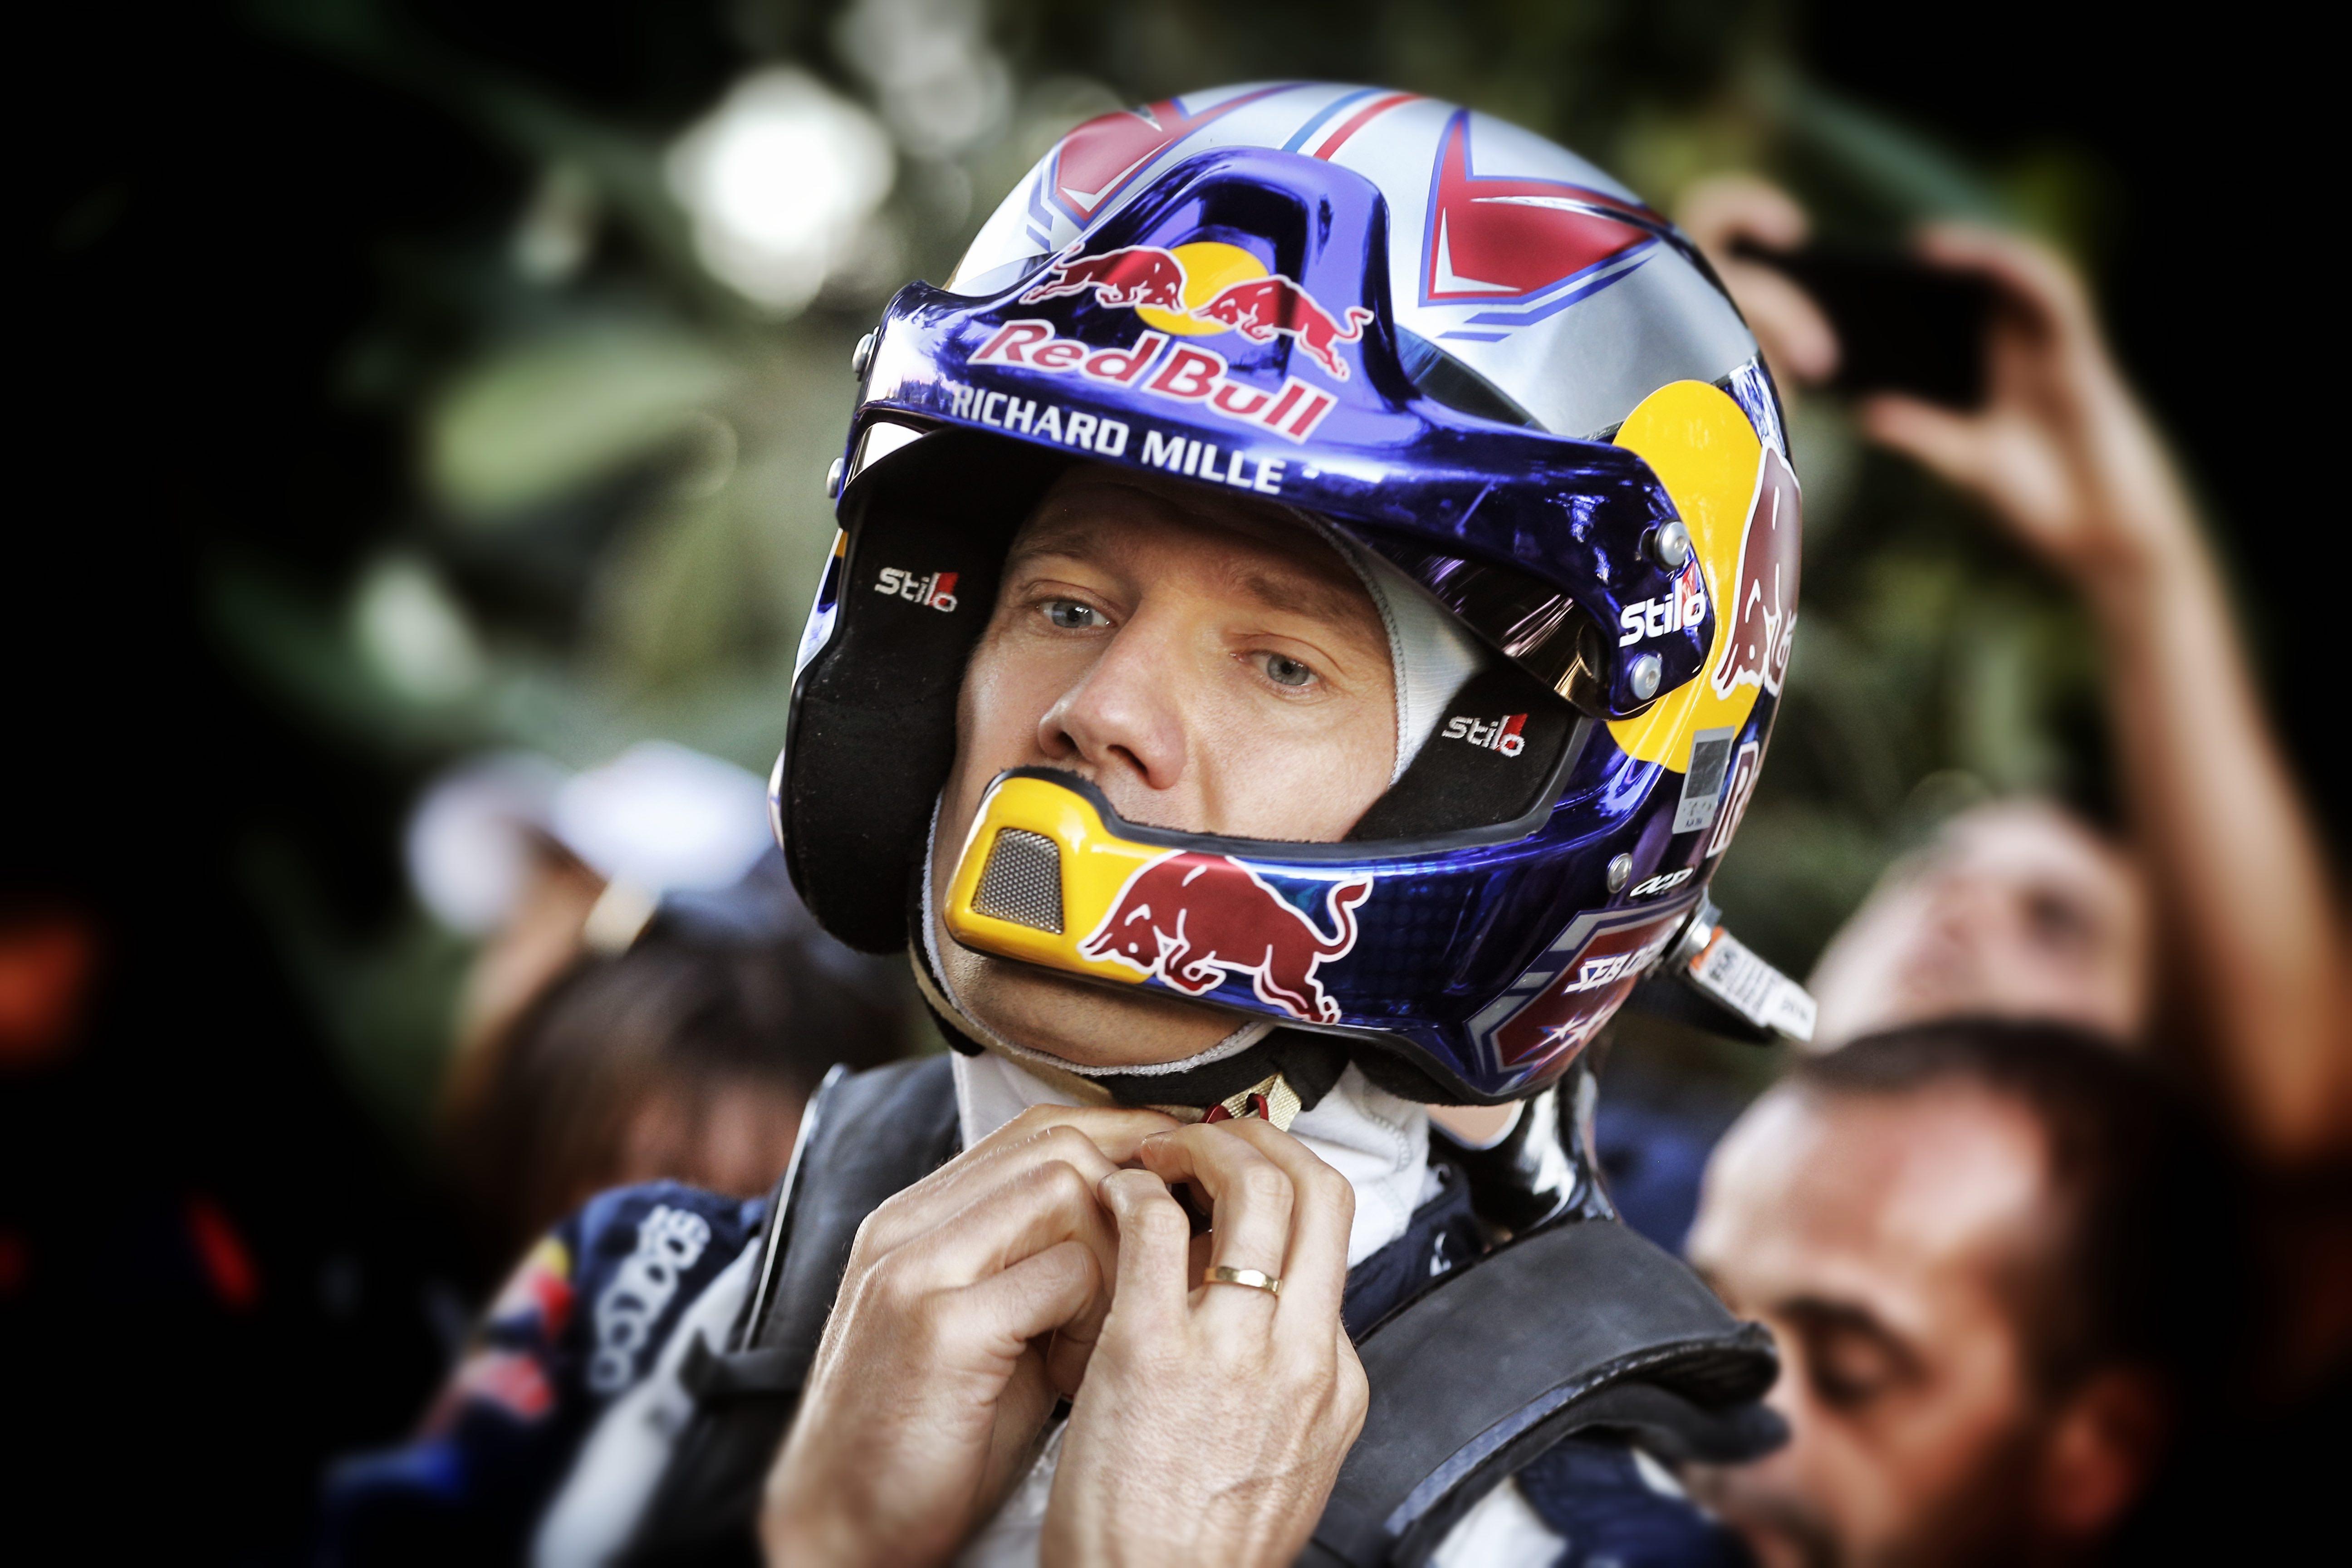 Ogier, Neuville and Tänak head for WRC title showdown